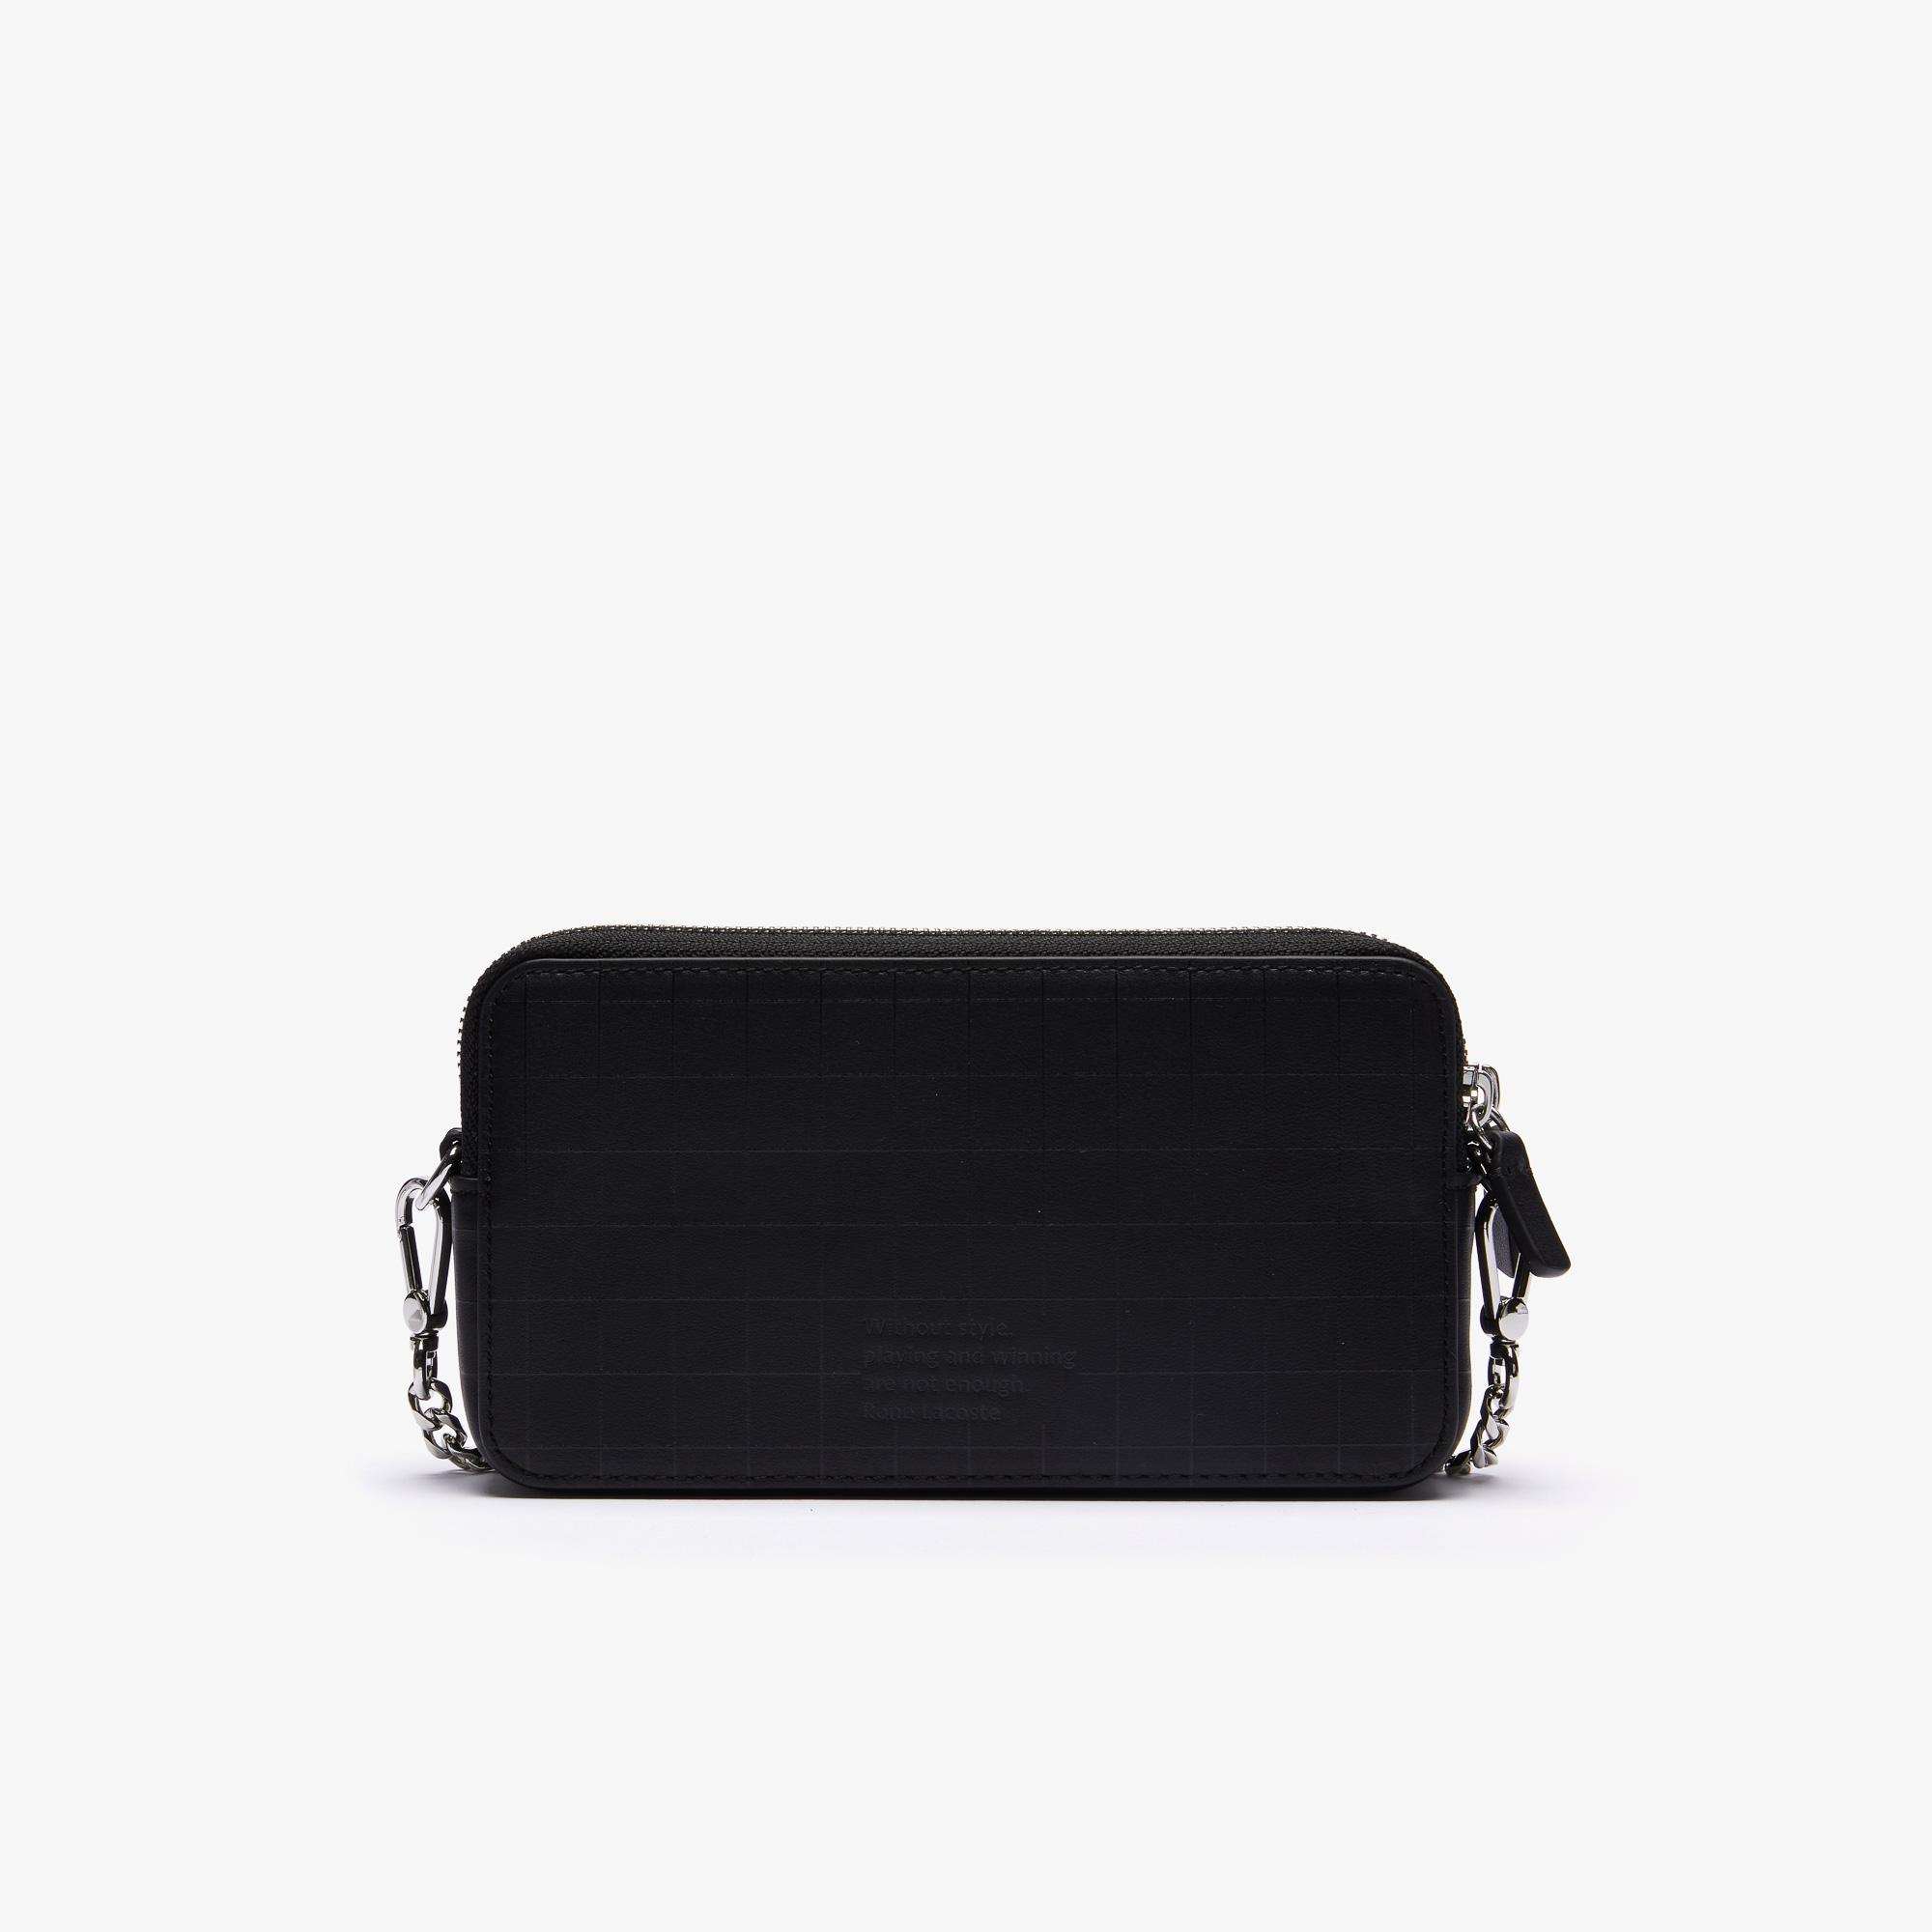 Lacoste сумка жіноча Infini-T